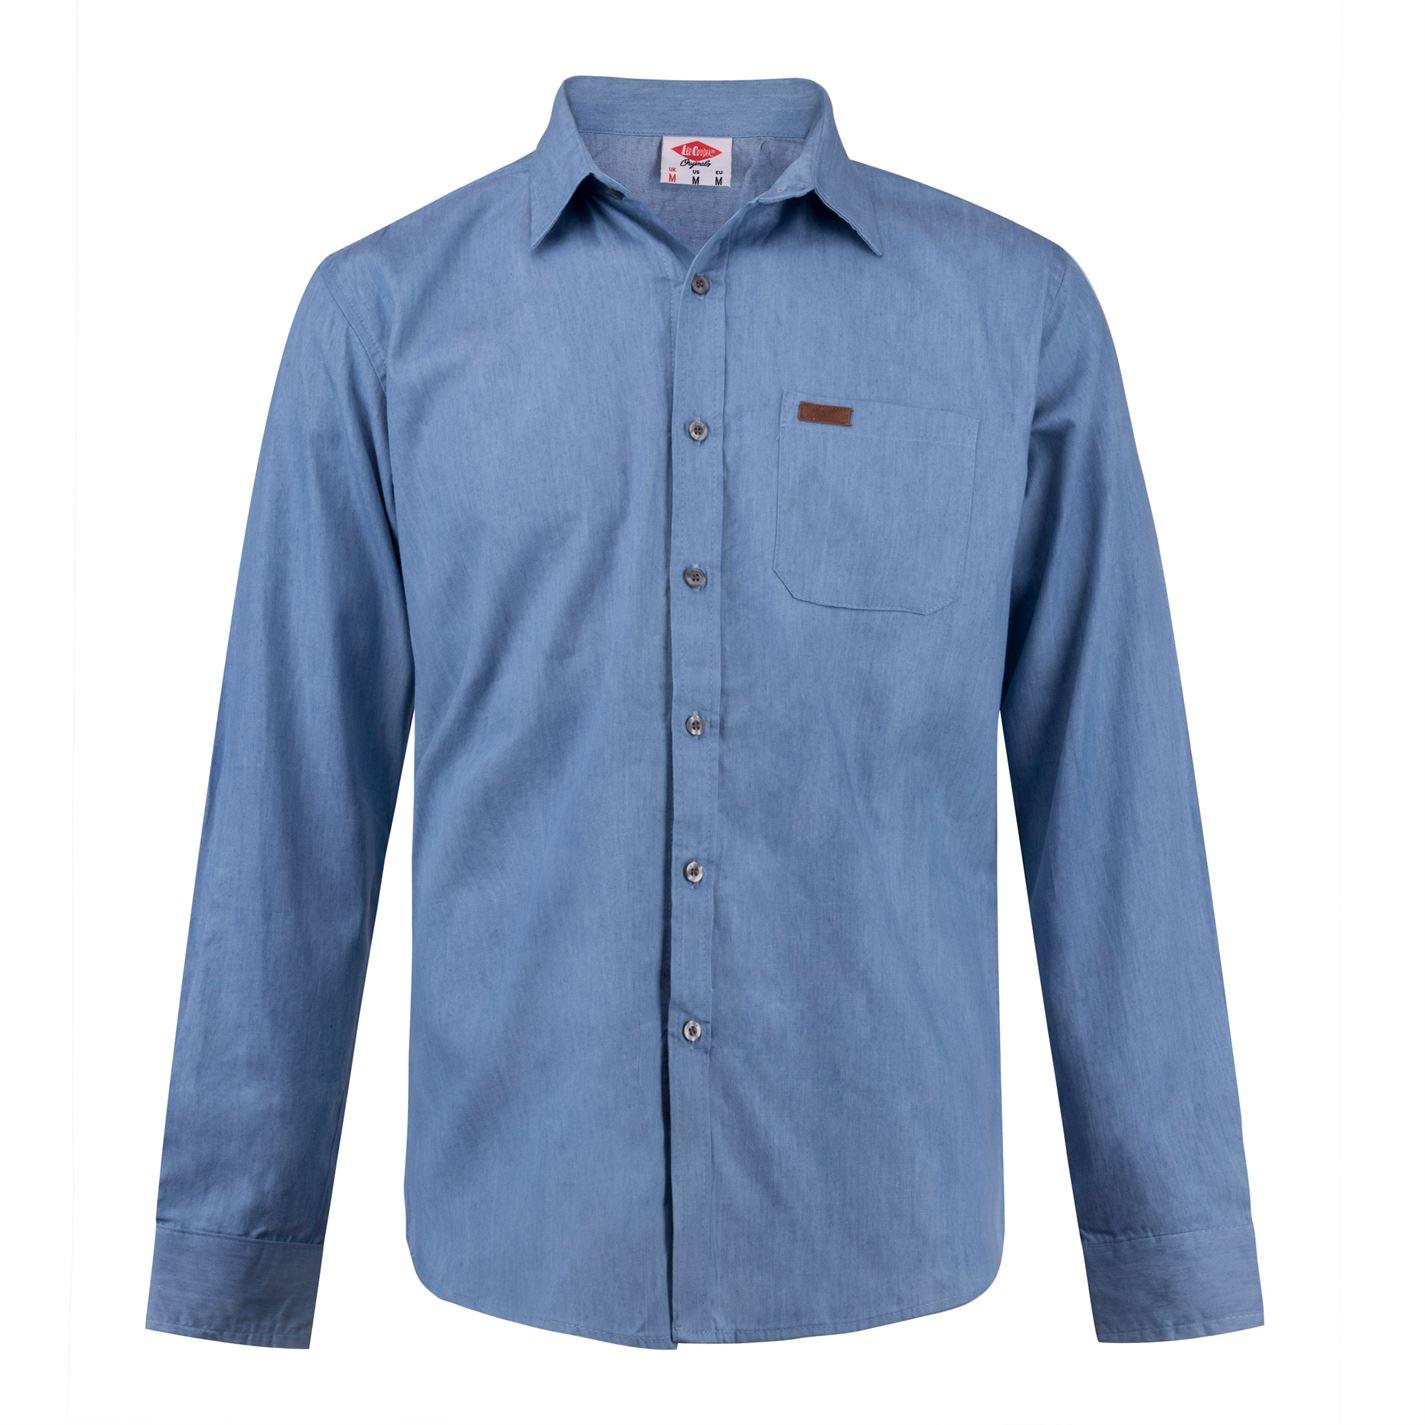 Lee Cooper Casual pánská denimová košile